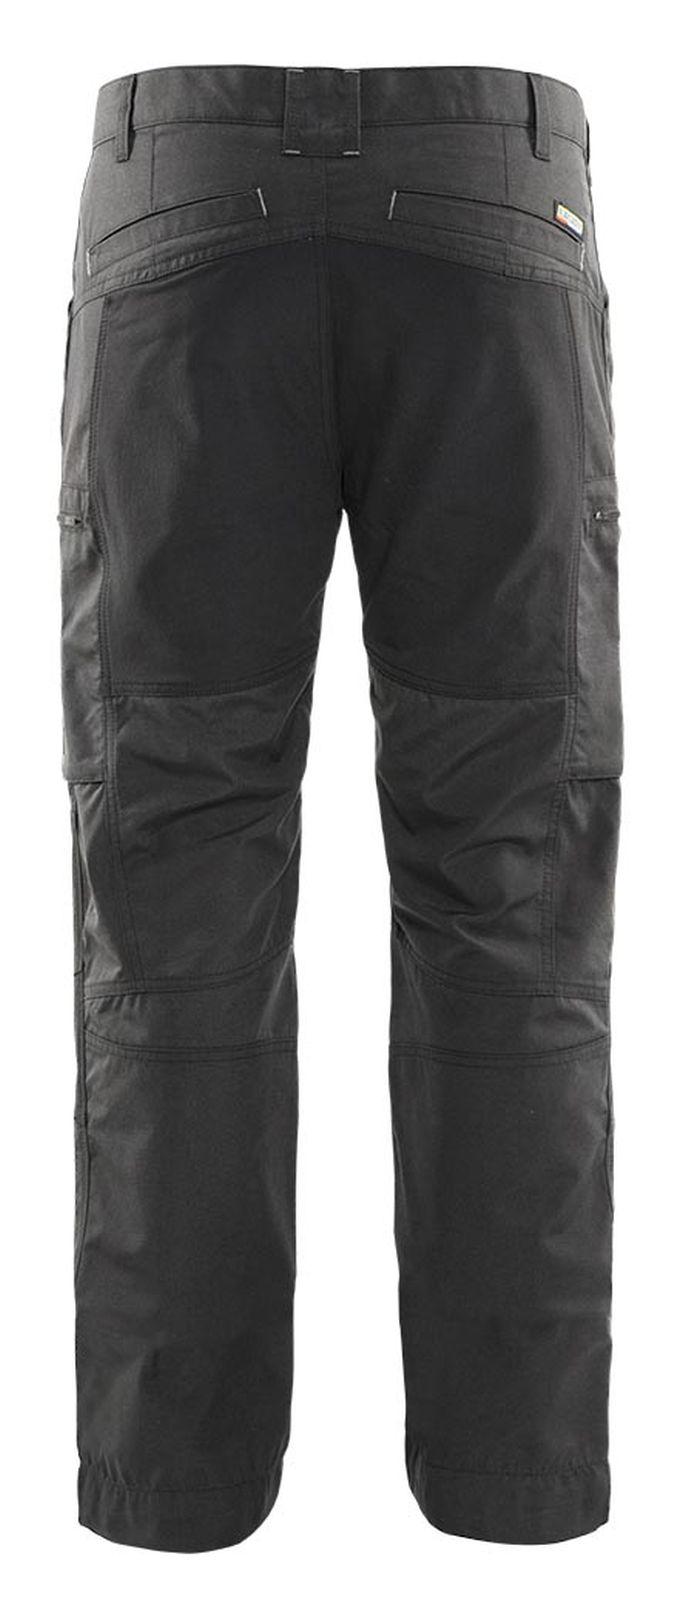 Blaklader Werkbroeken 14591845 met Stretch donkergrijs-zwart(9899)